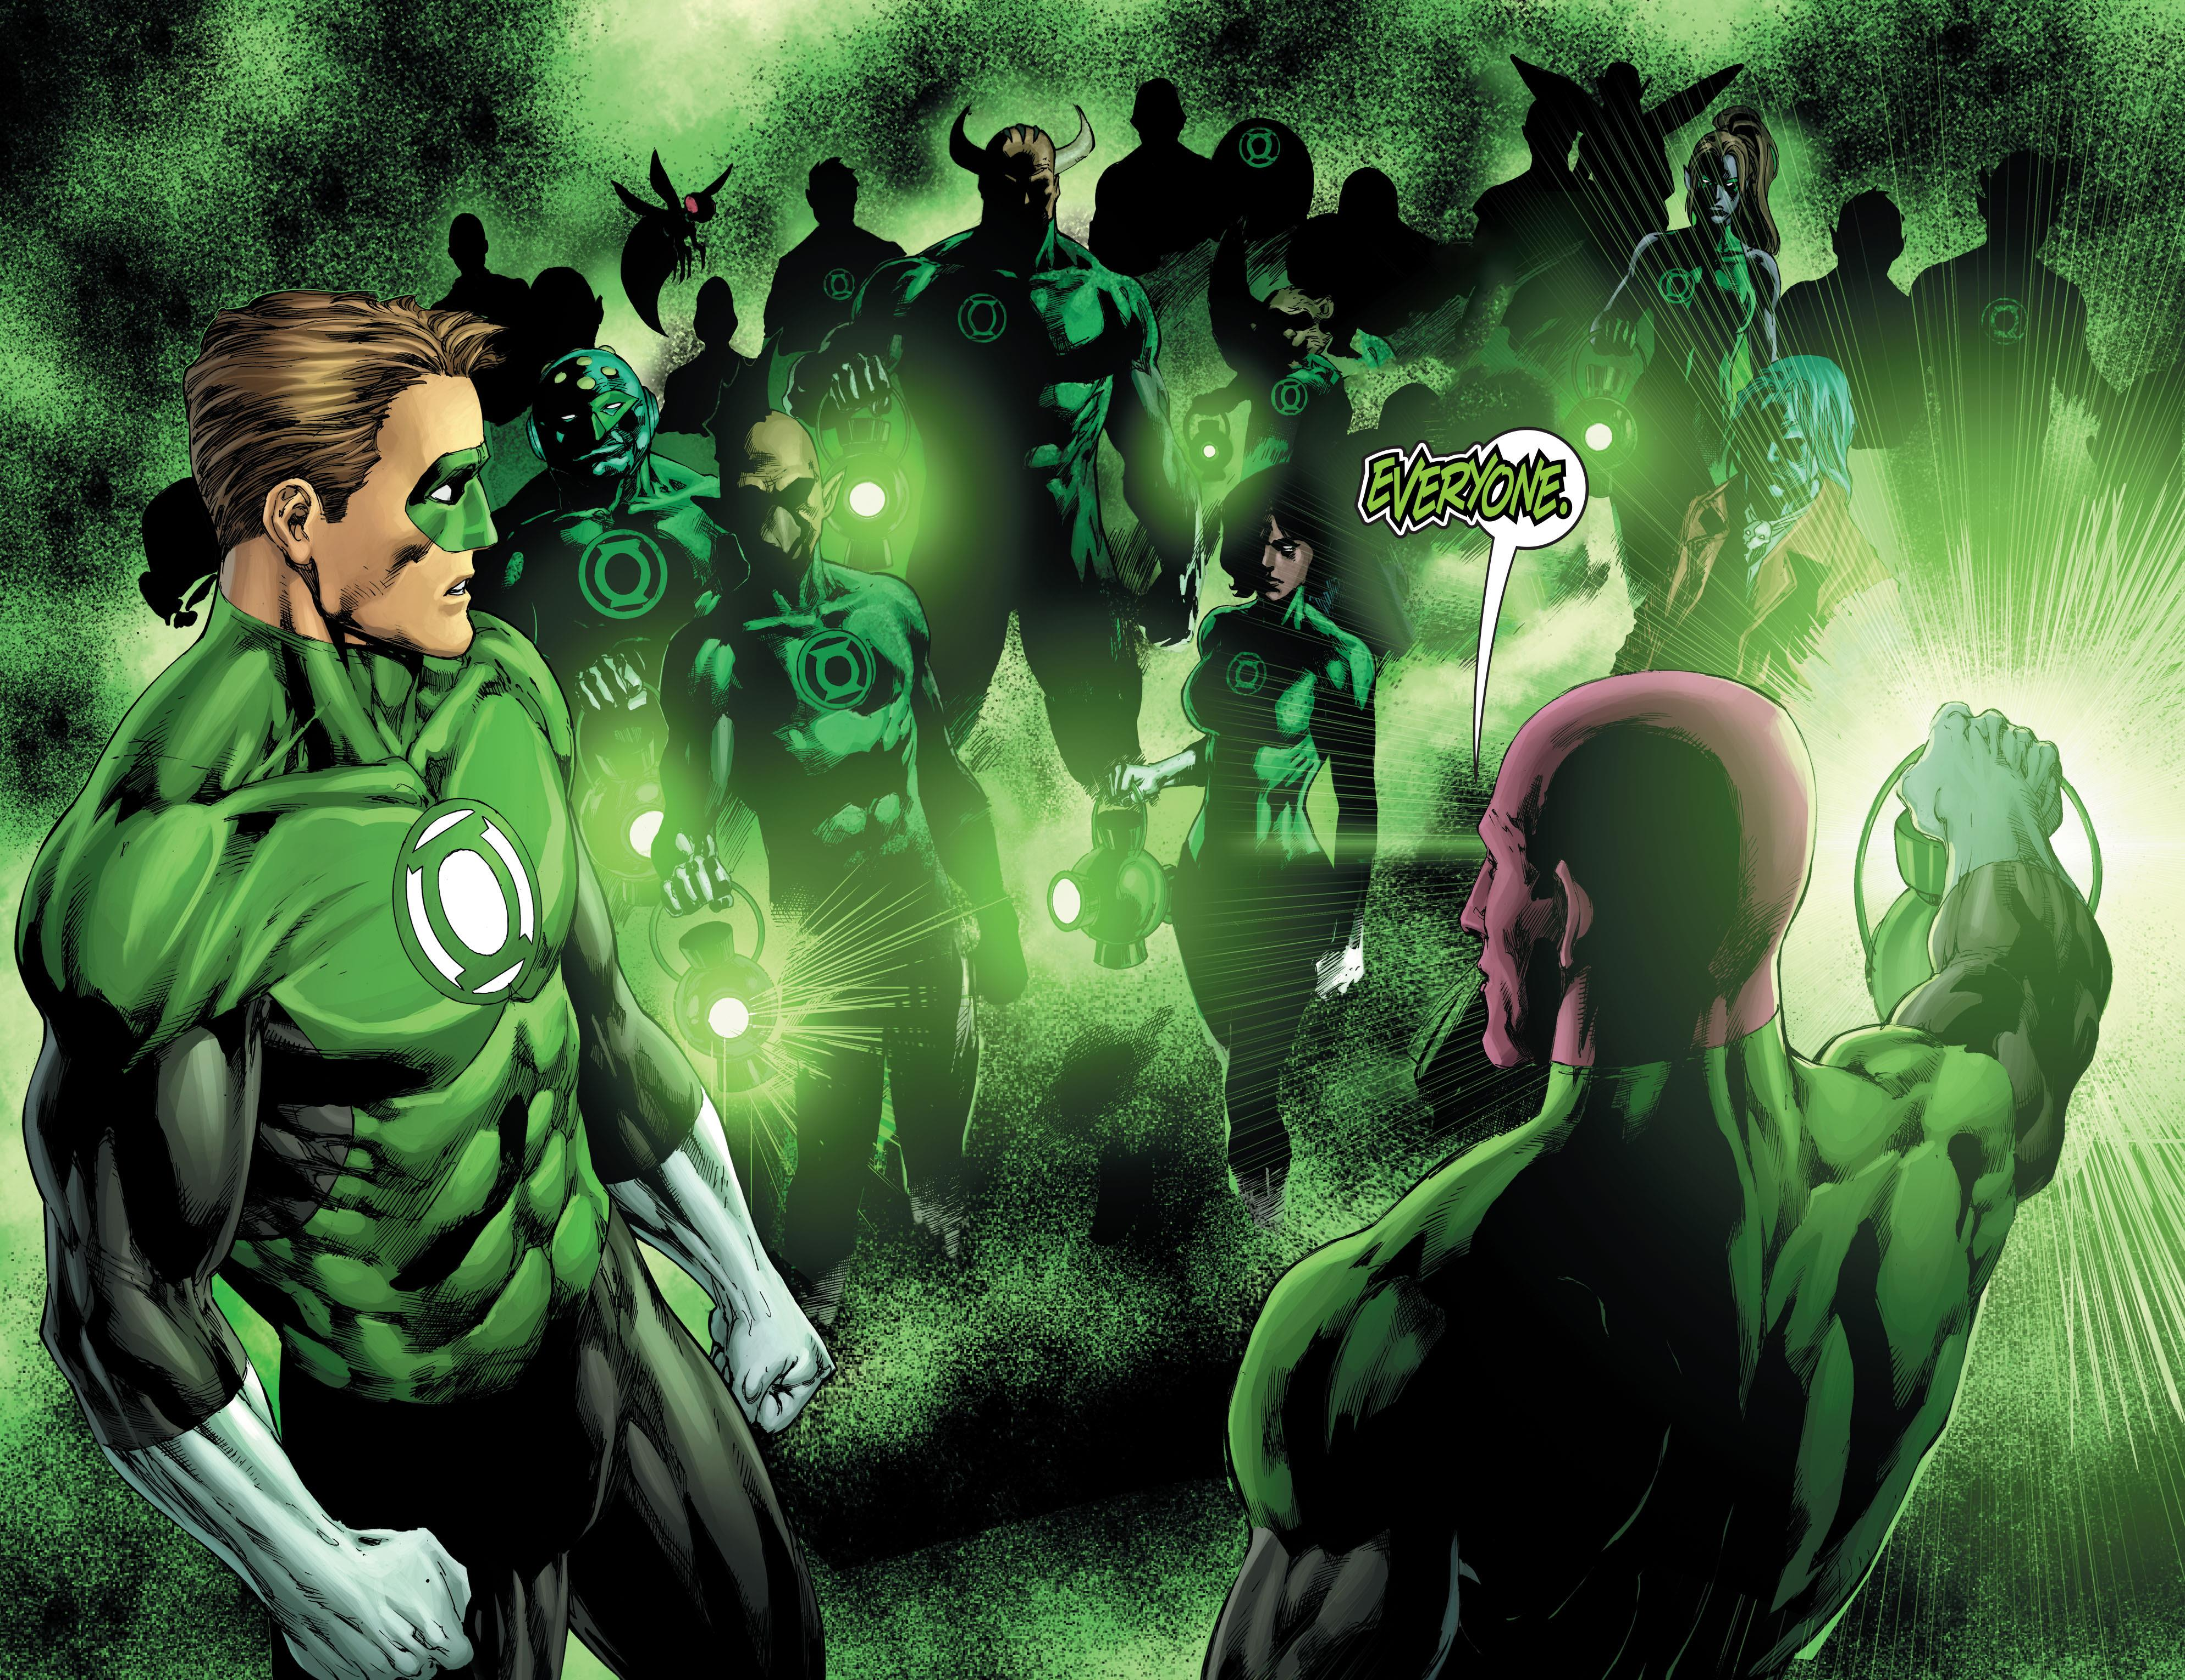 Green Lantern Comic Wallpaper: Green Lantern Corps 4k Ultra HD Wallpaper